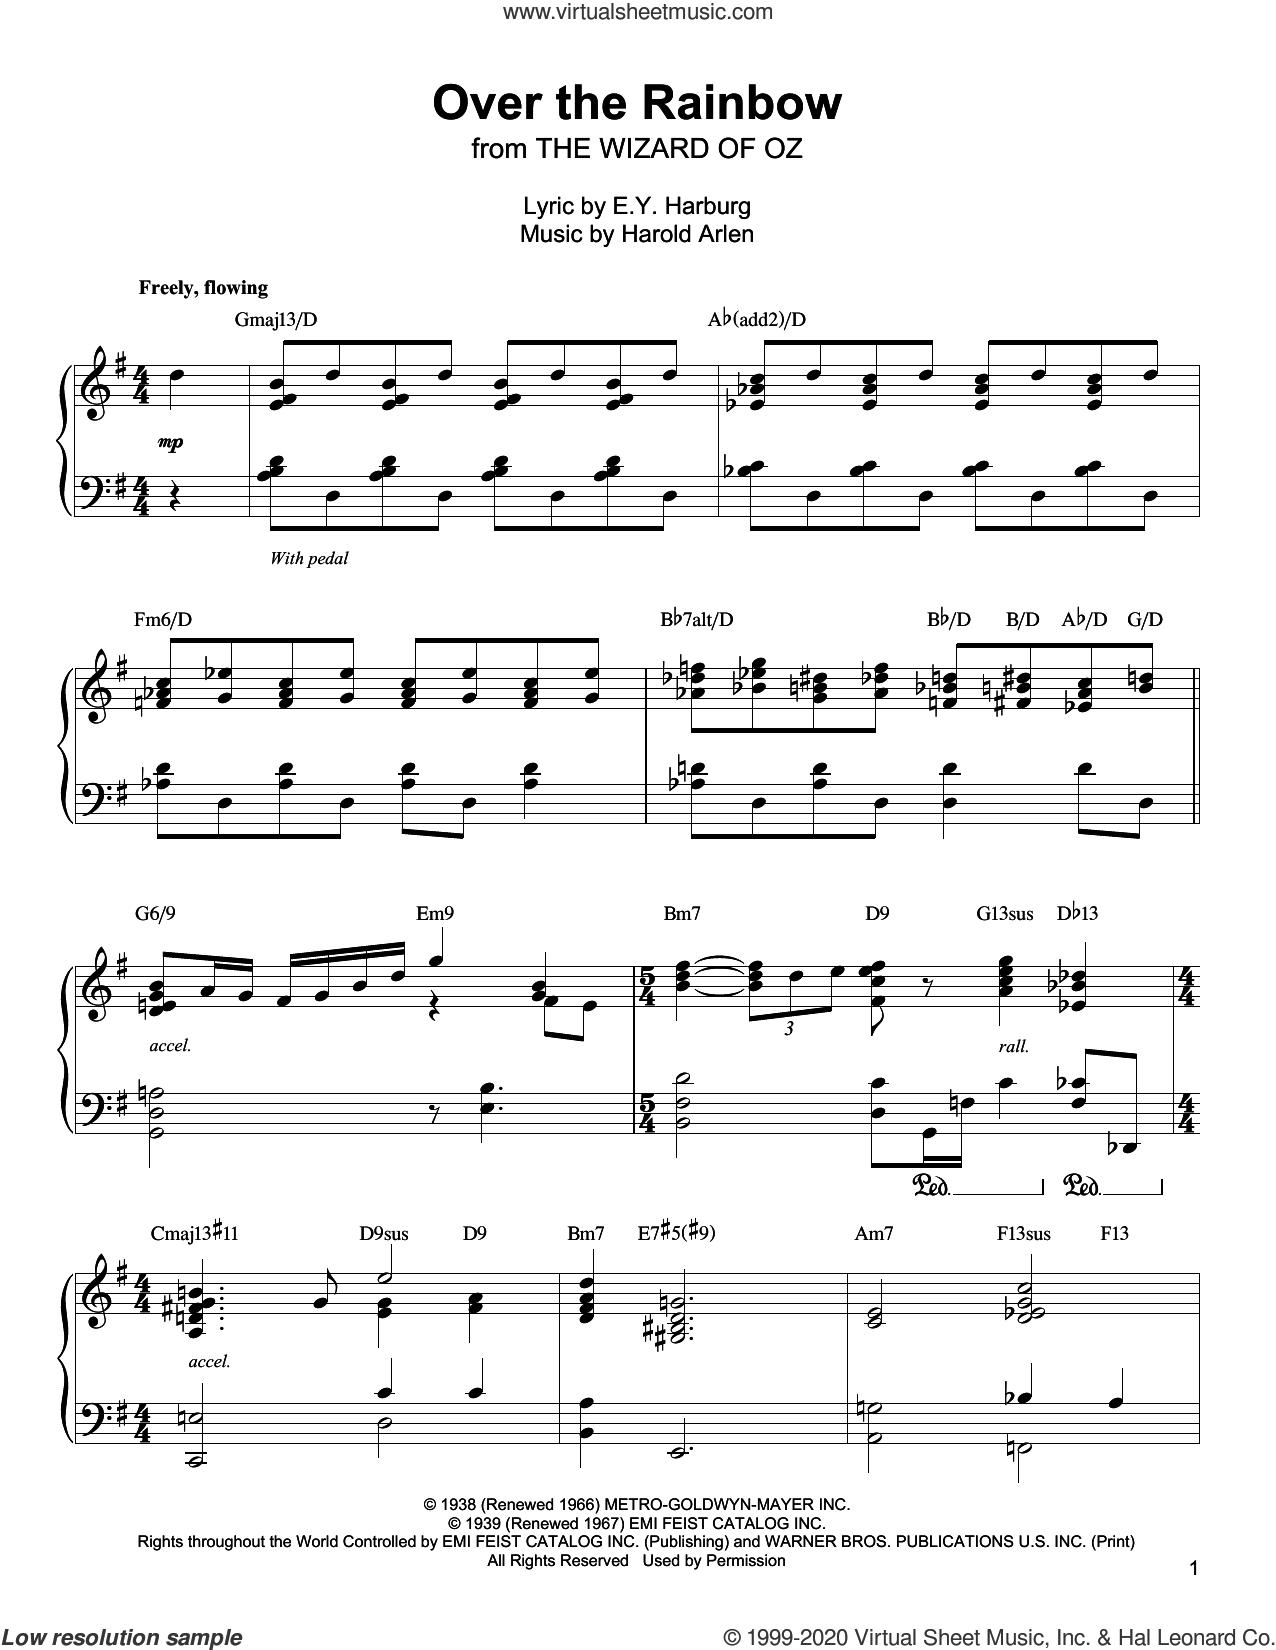 Over The Rainbow sheet music for piano solo (transcription) by Oscar Peterson, E.Y. Harburg and Harold Arlen, intermediate piano (transcription)